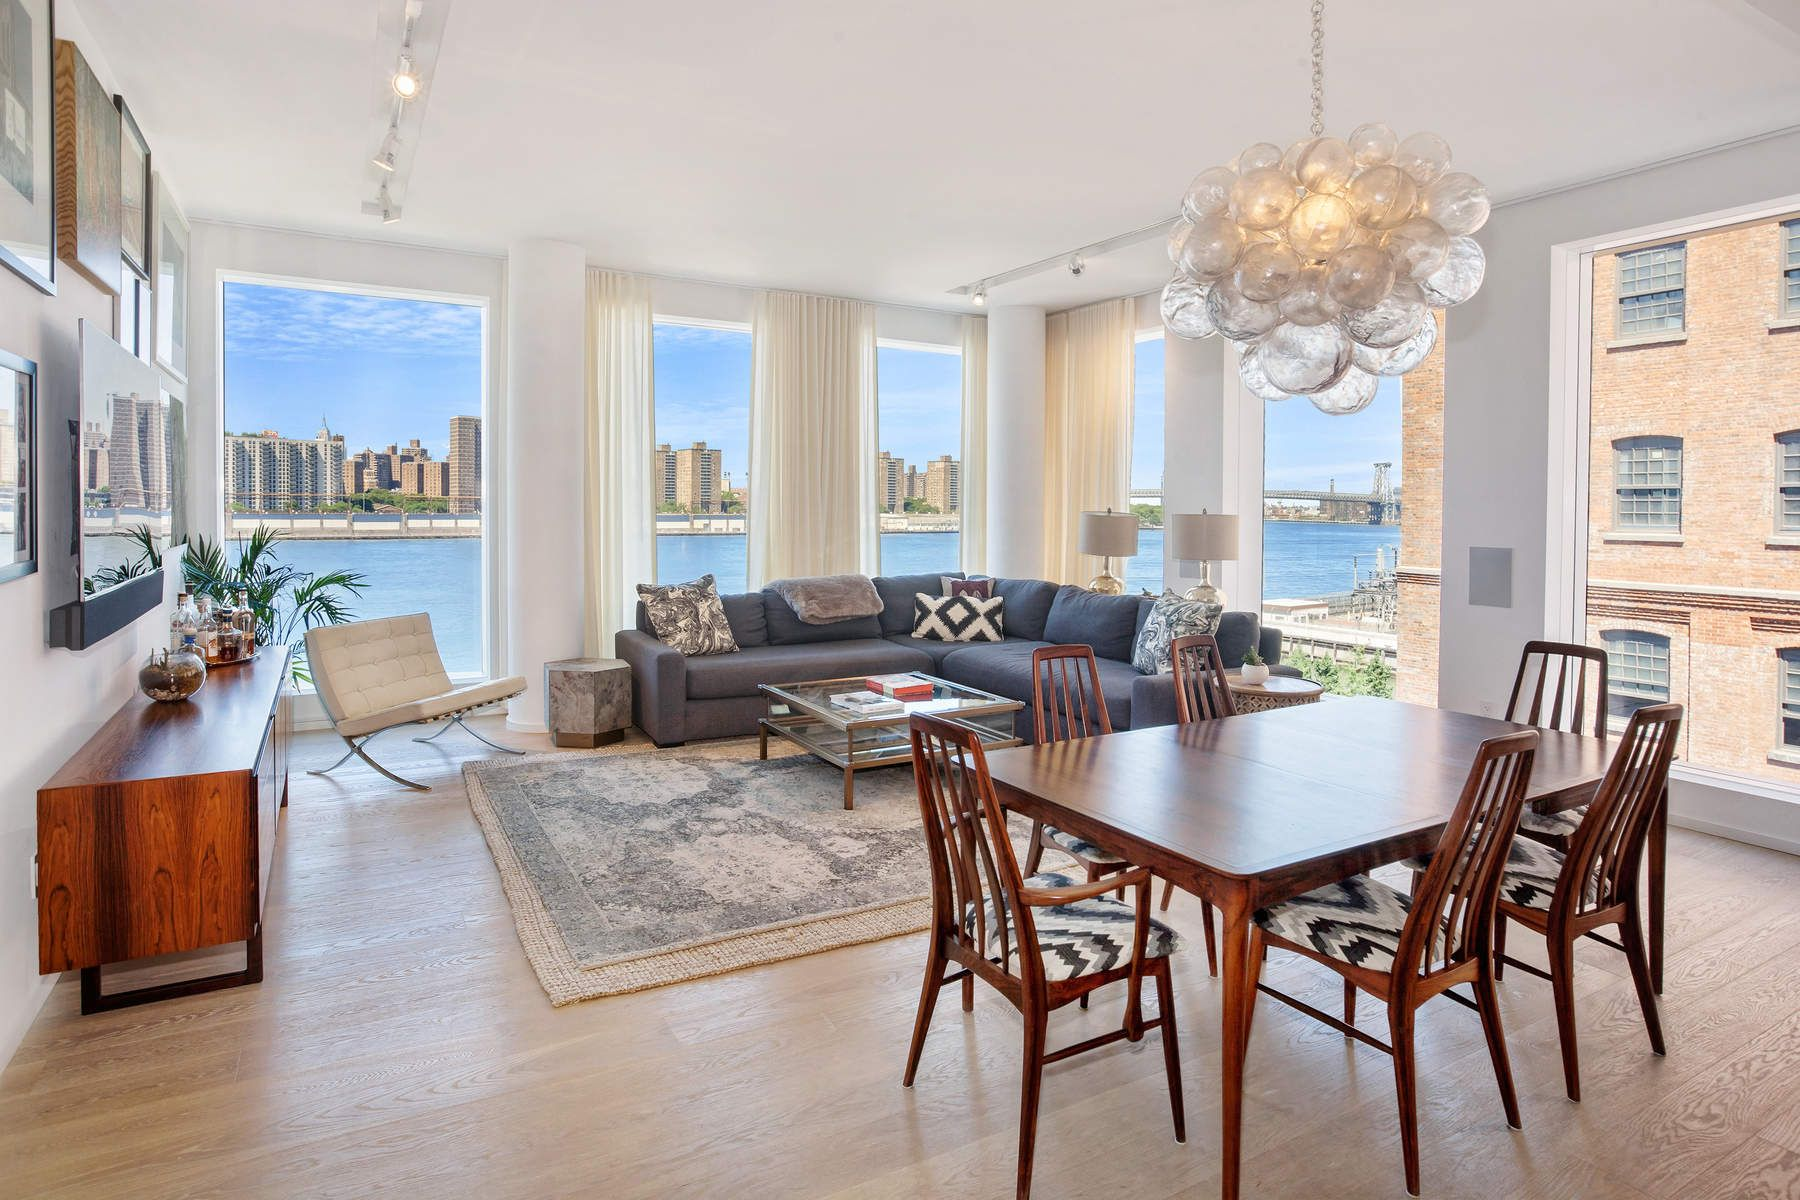 Condominium for Sale at Stunning 4-Bedroom at 1 John Street 1 John Street Apt 5D Brooklyn, New York 11201 United States